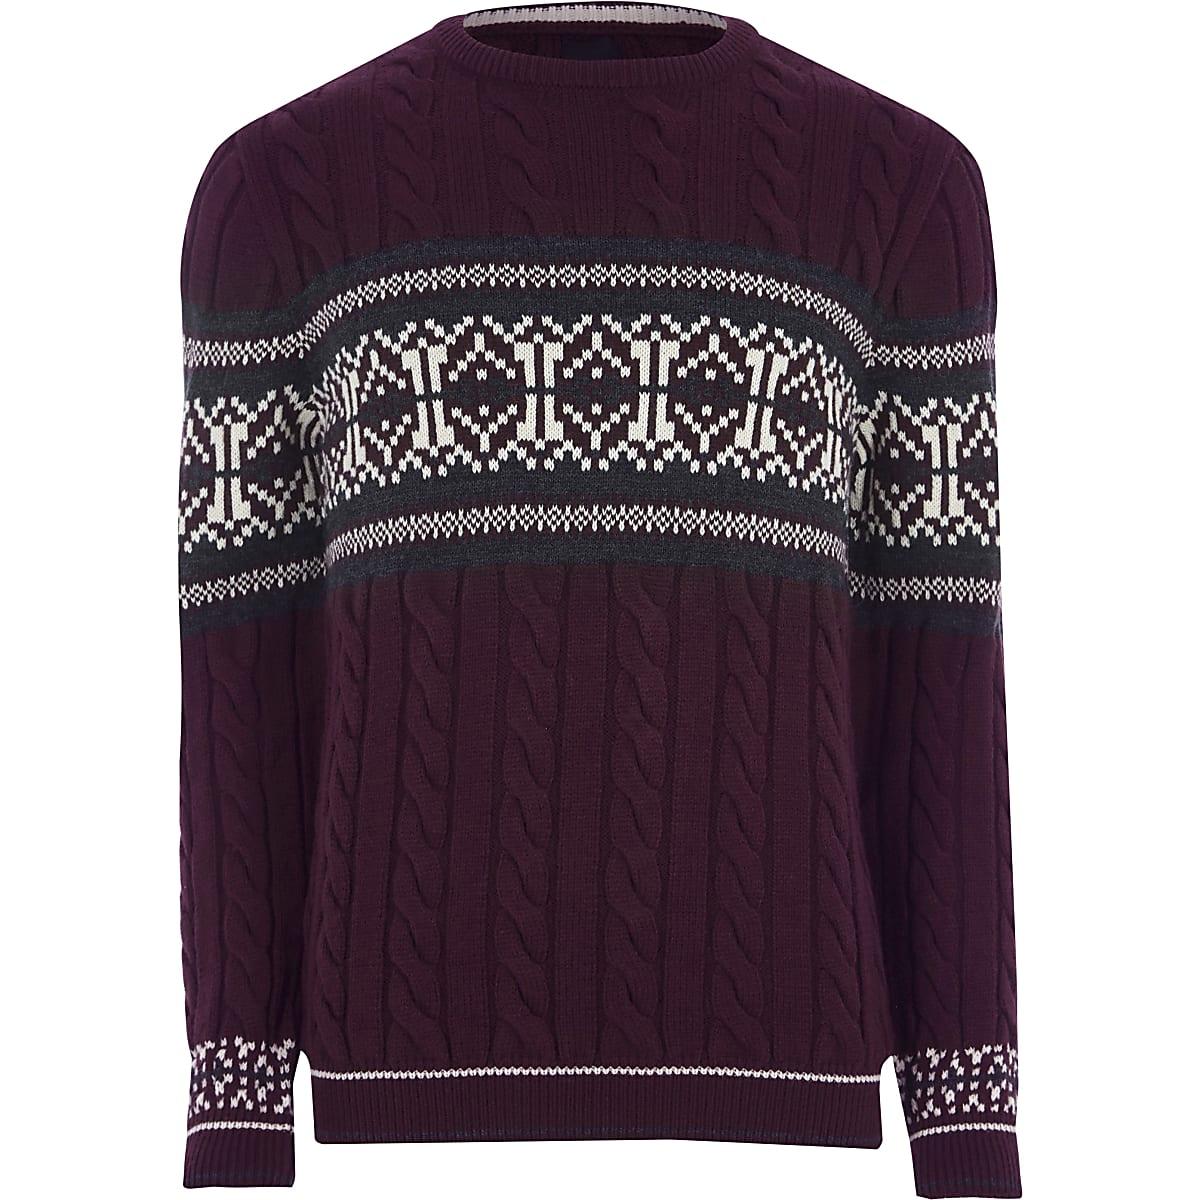 Burgundy cable knit Fairisle Christmas jumper